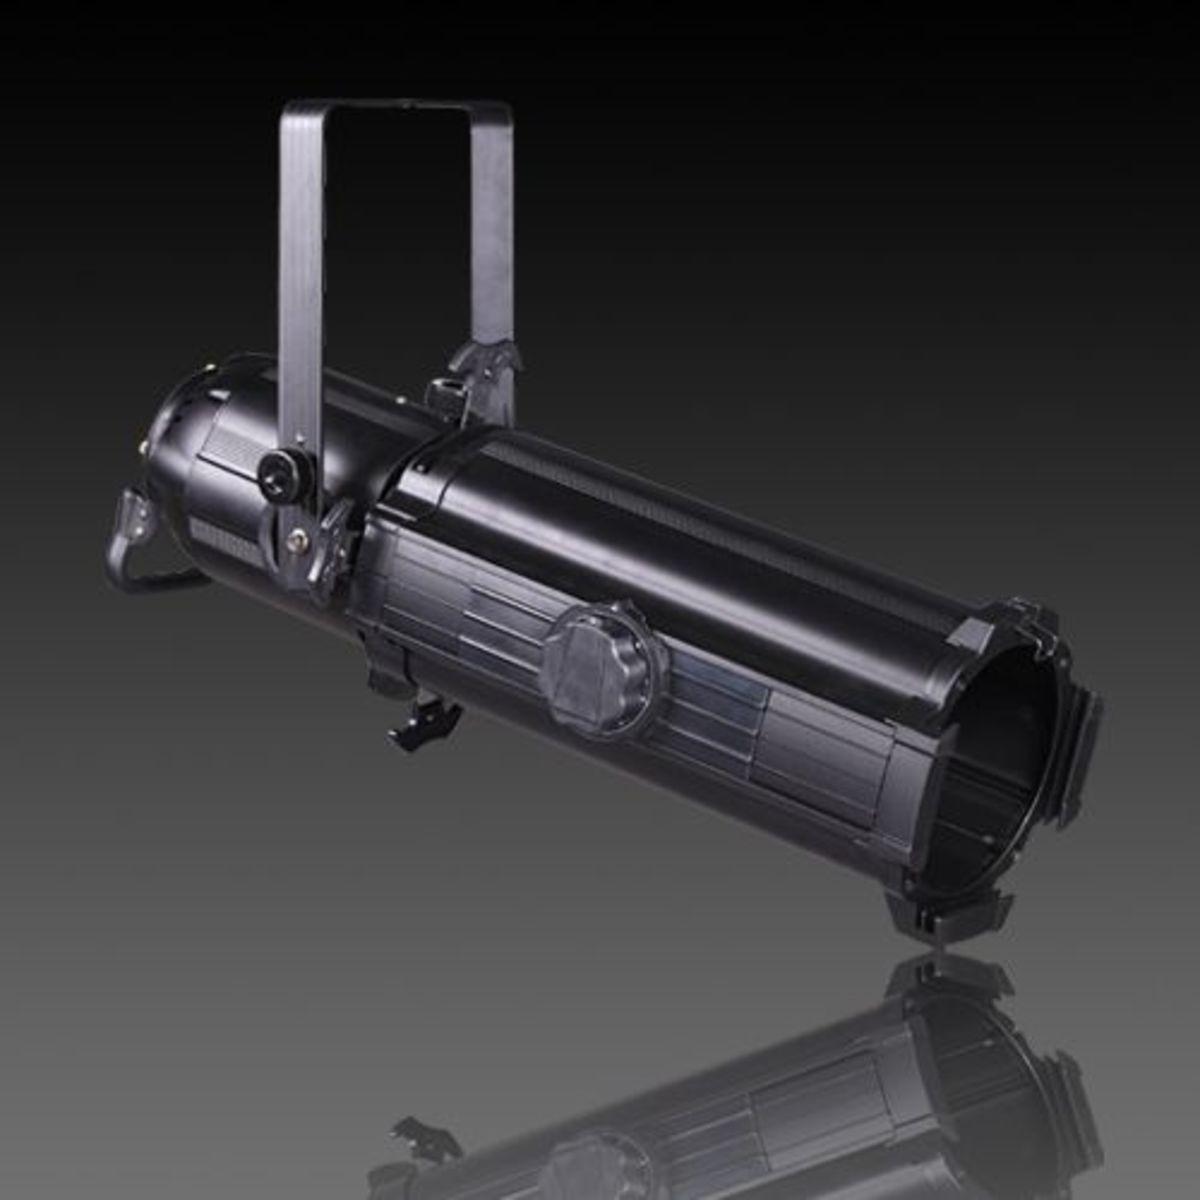 IMAGE 14: Zoom instrument